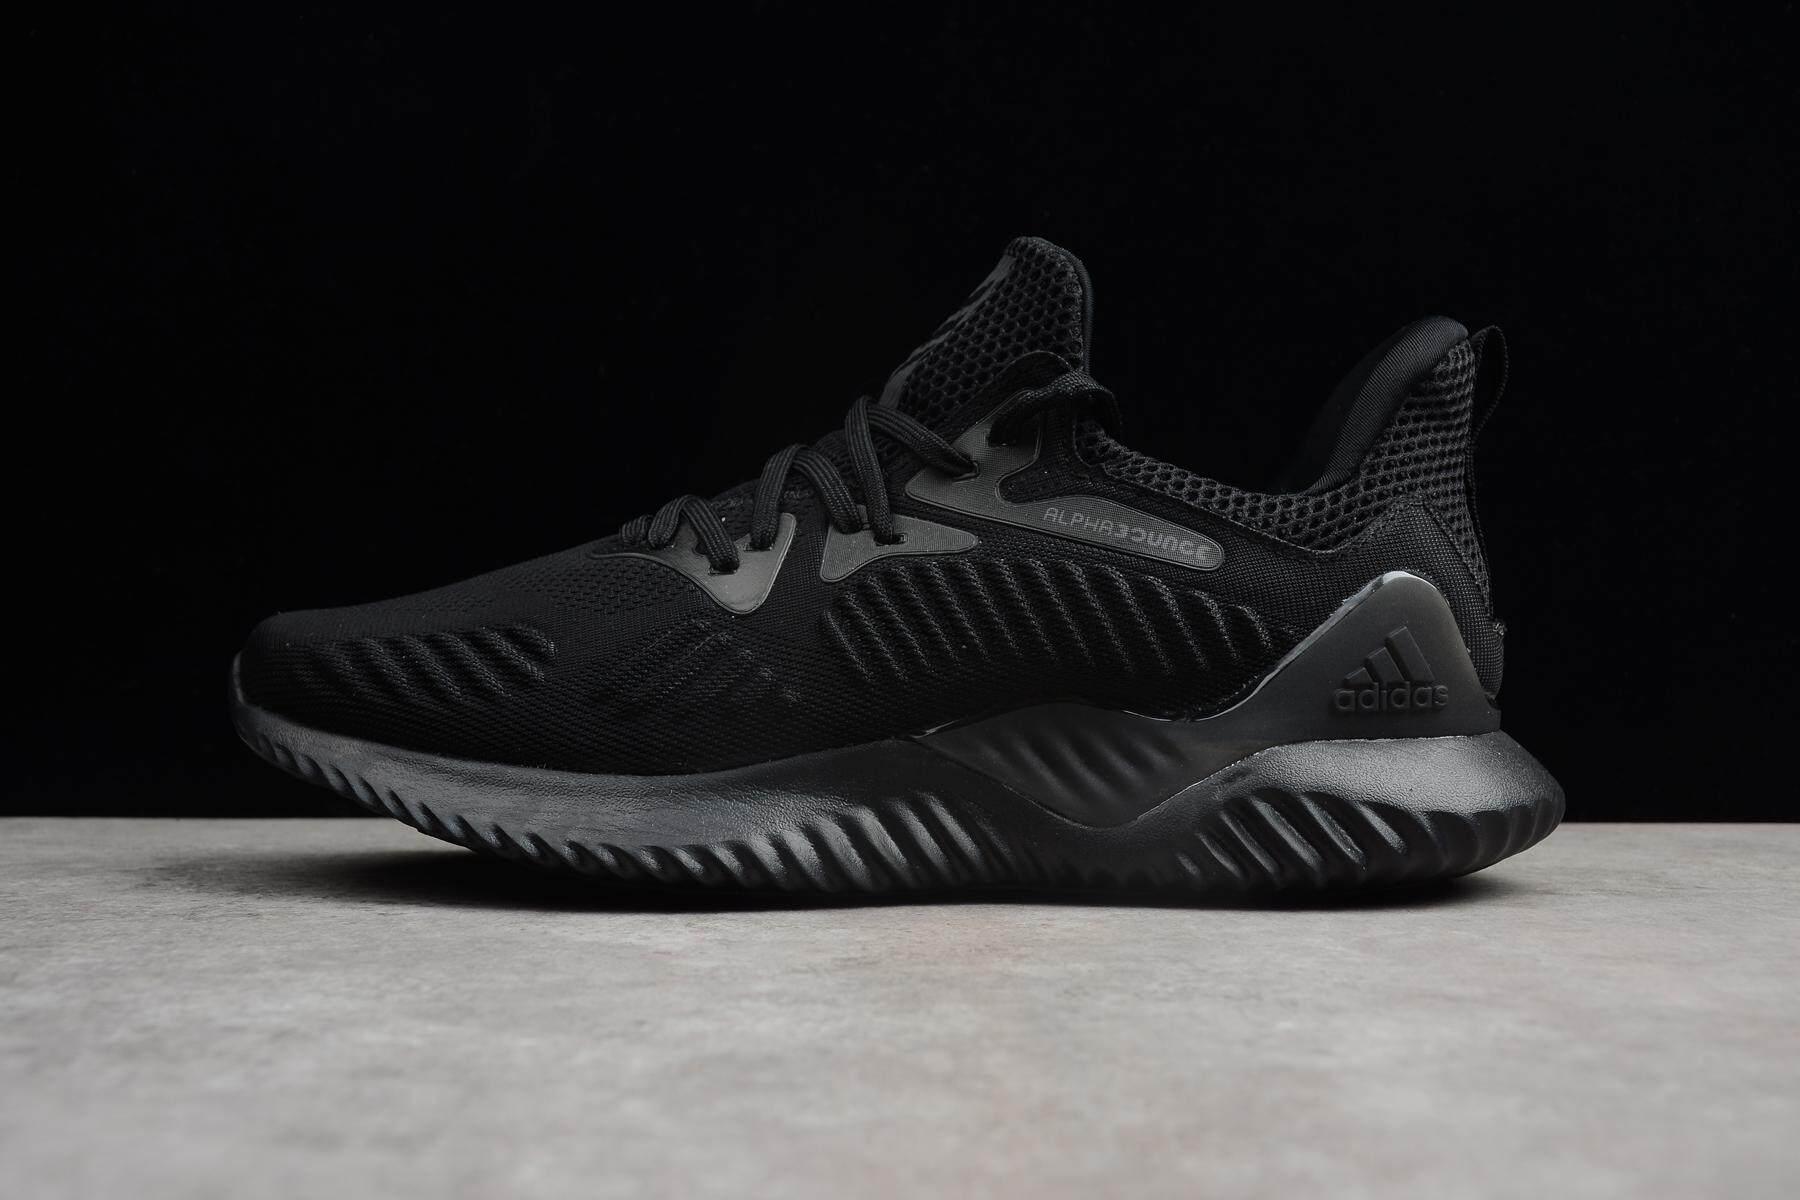 Adidas Mens Shoes Price In Malaysia Best Lazada Sepatu Casual Original Ultraboost Black Grey